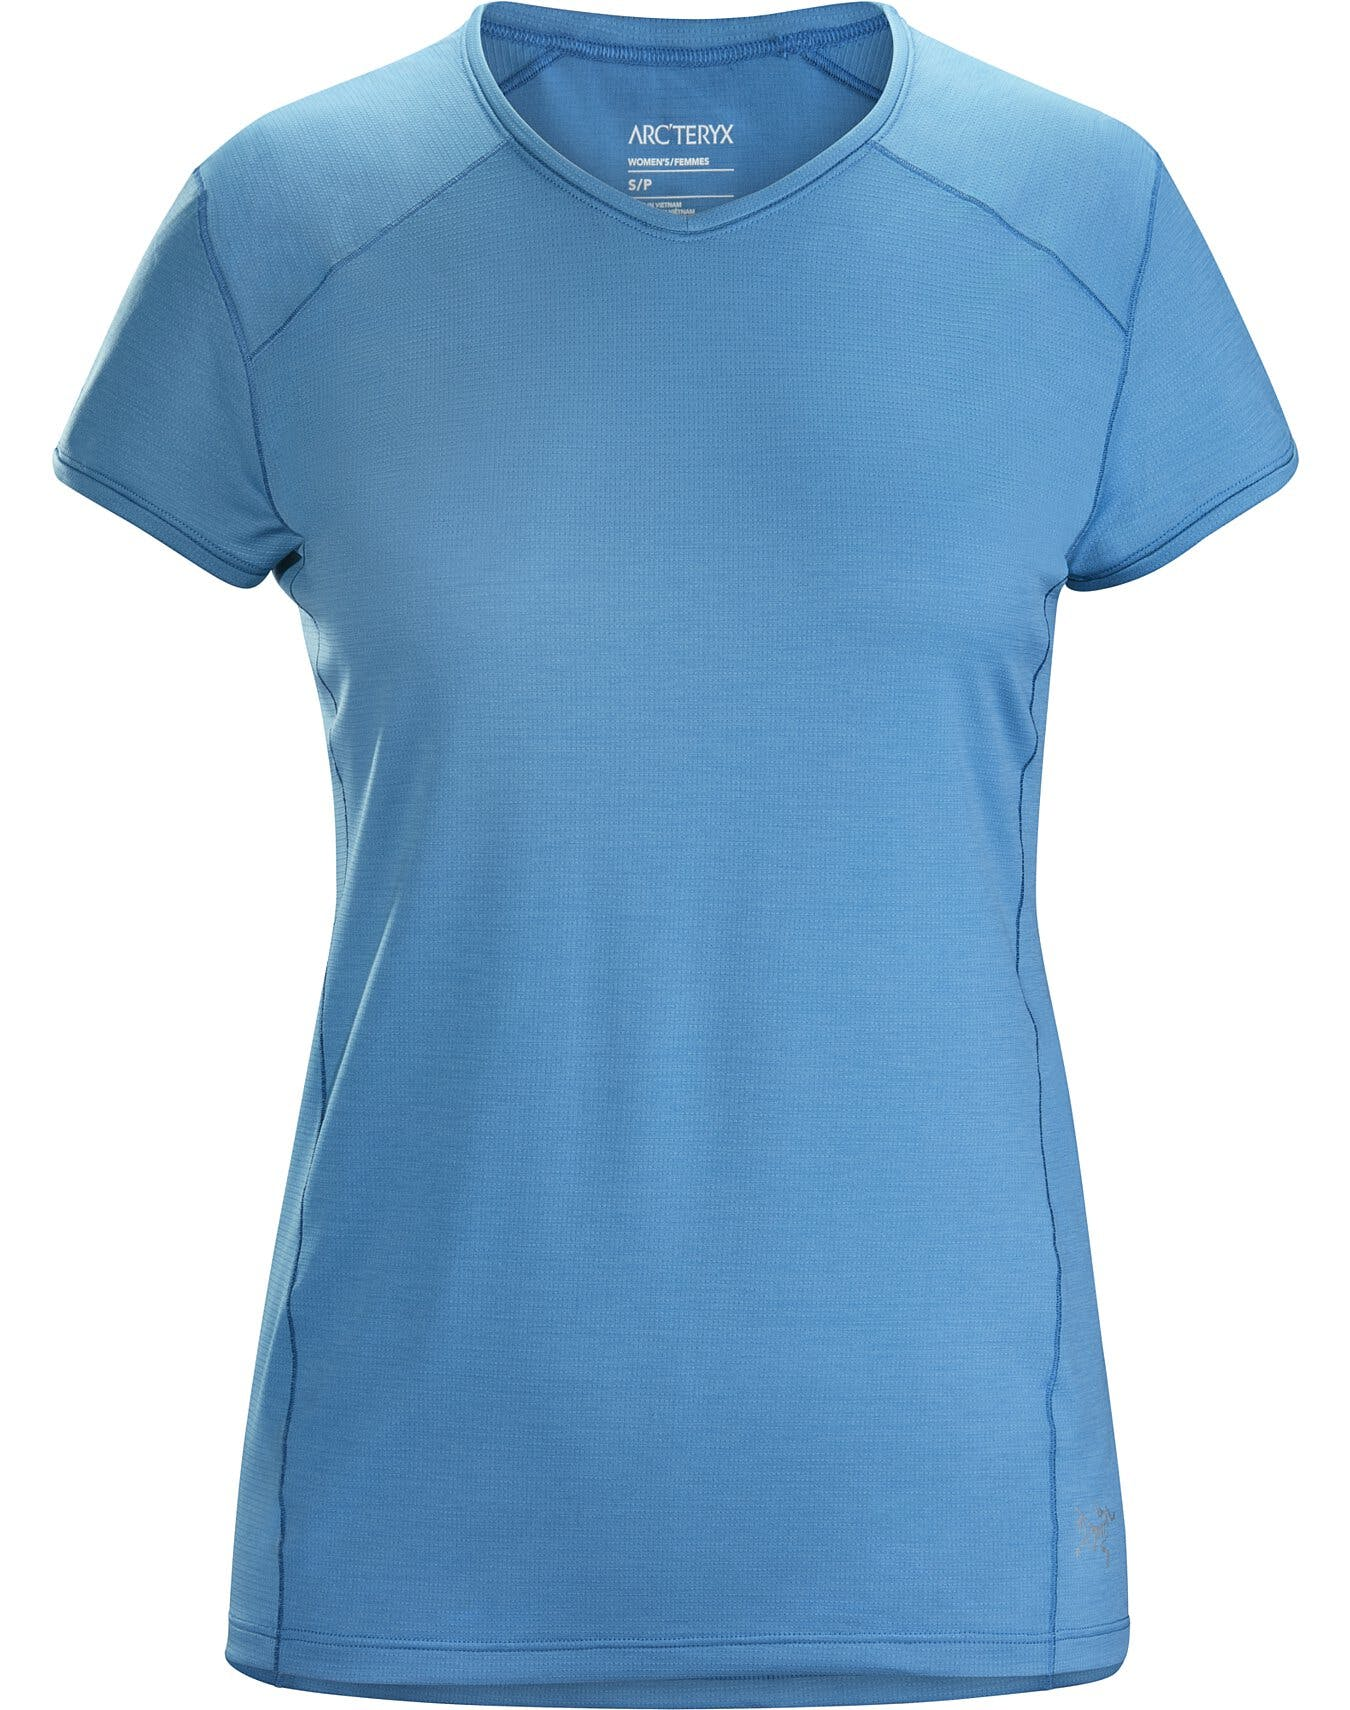 Arcteryx Womens Tolu Top Ss Sleeveless Sleeveless Shirt